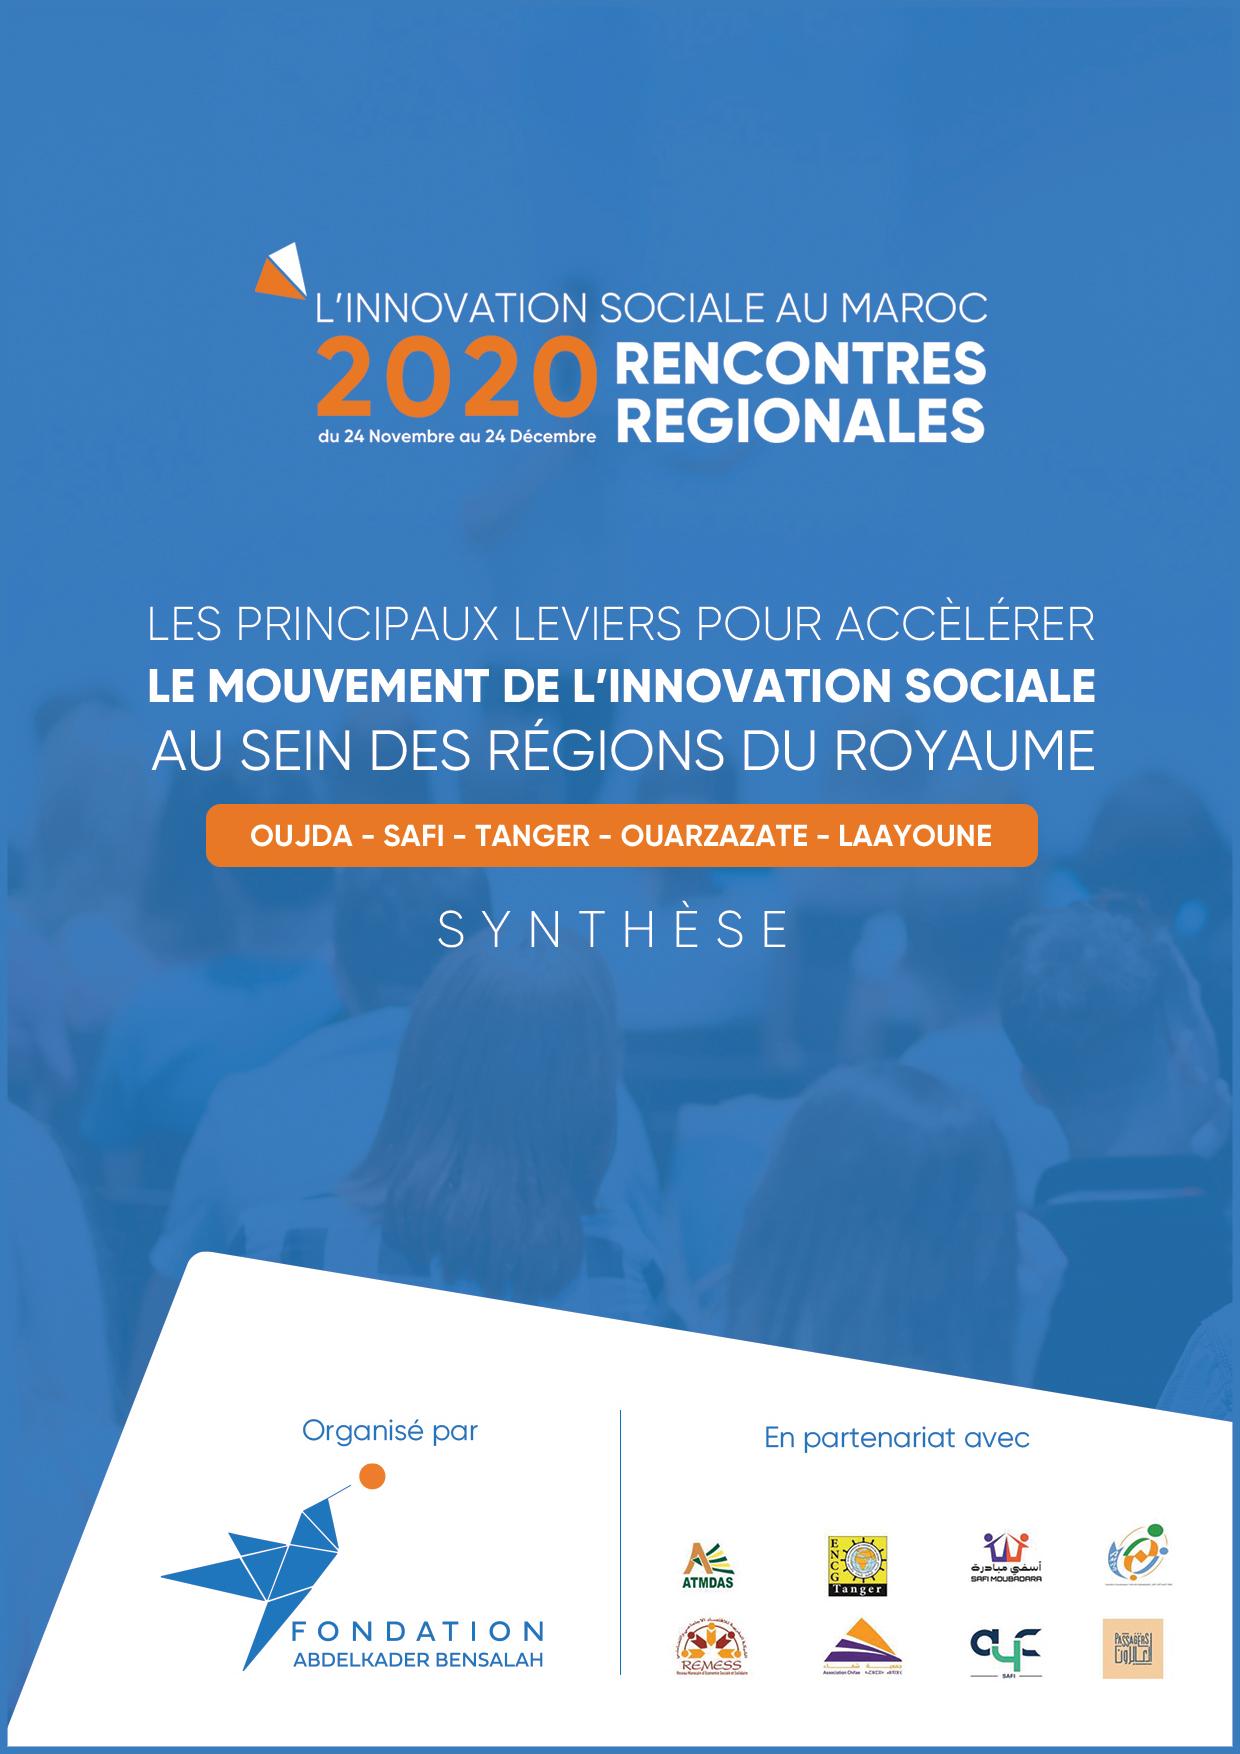 RENCONTRES REGIONALES 2020